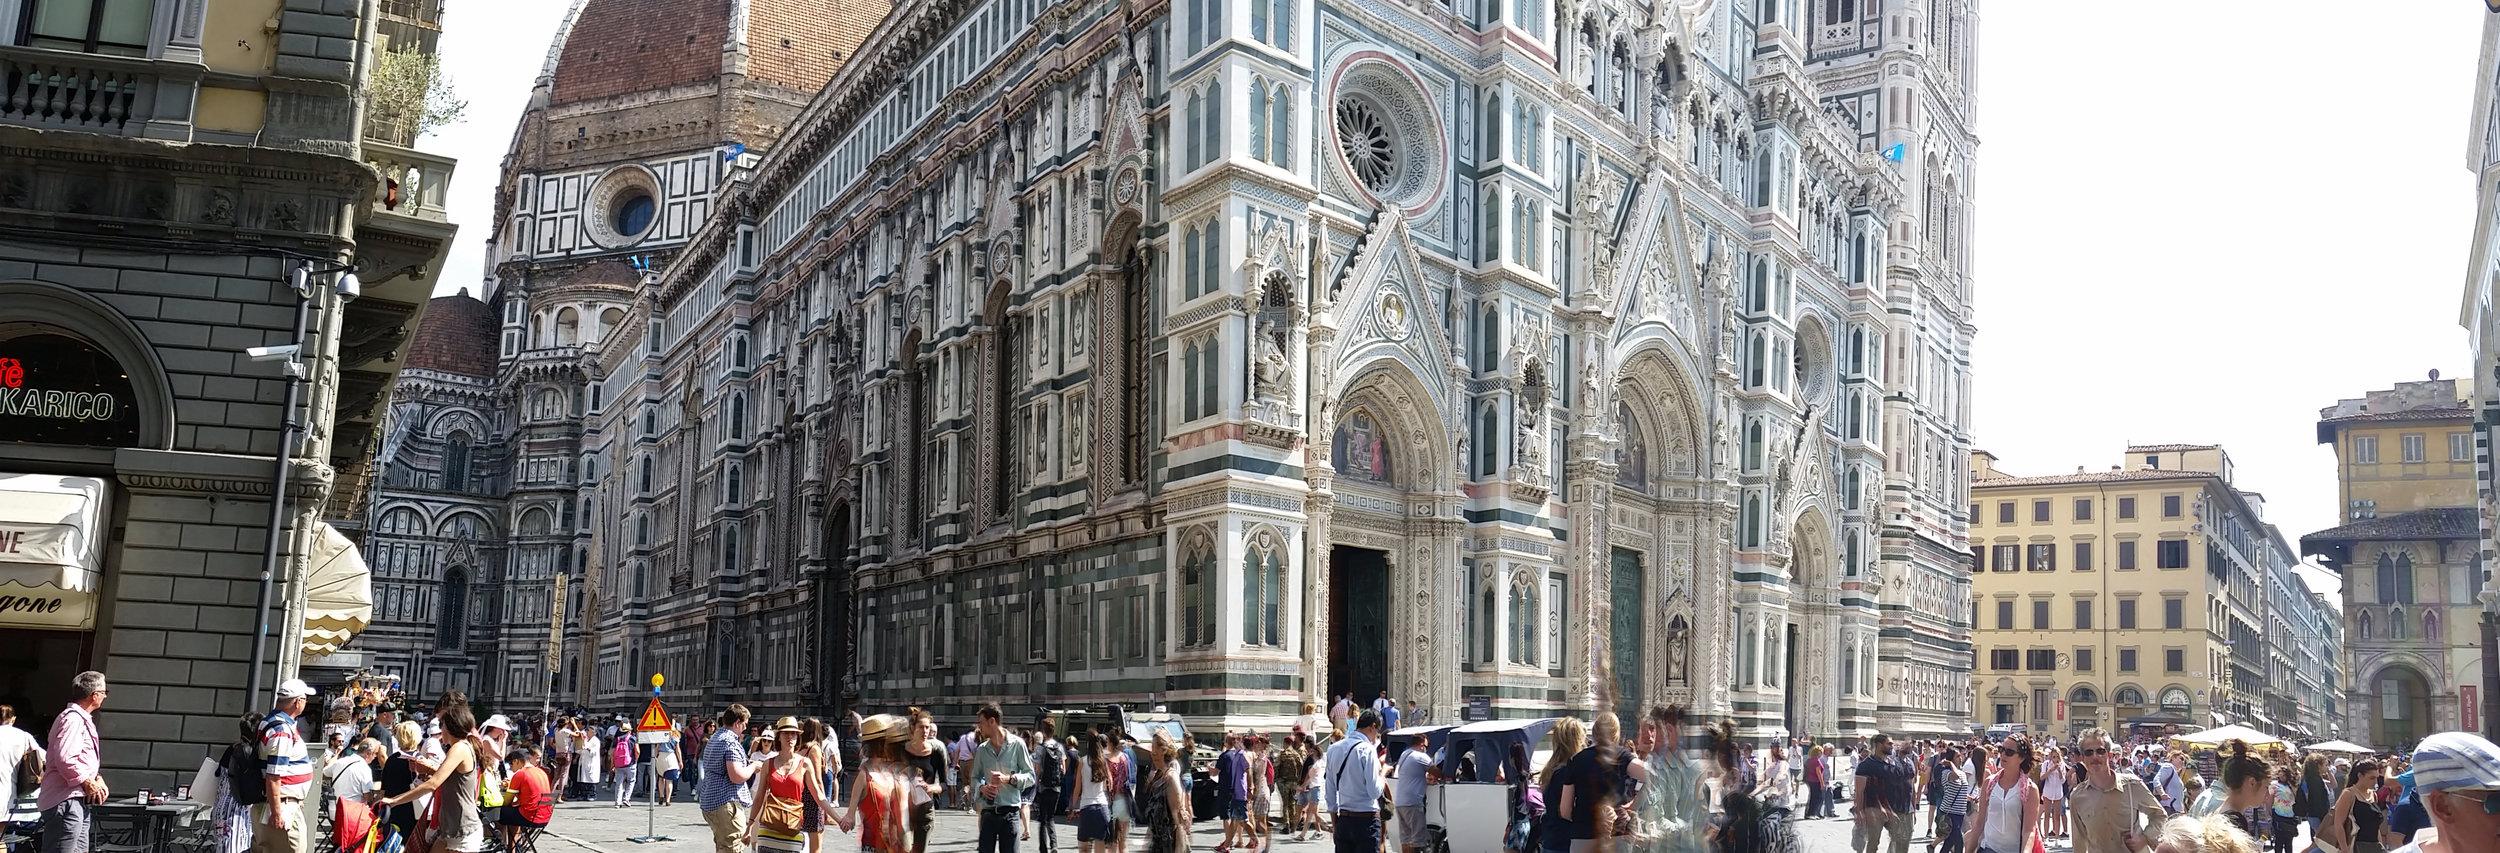 Duomo panoramic.jpg